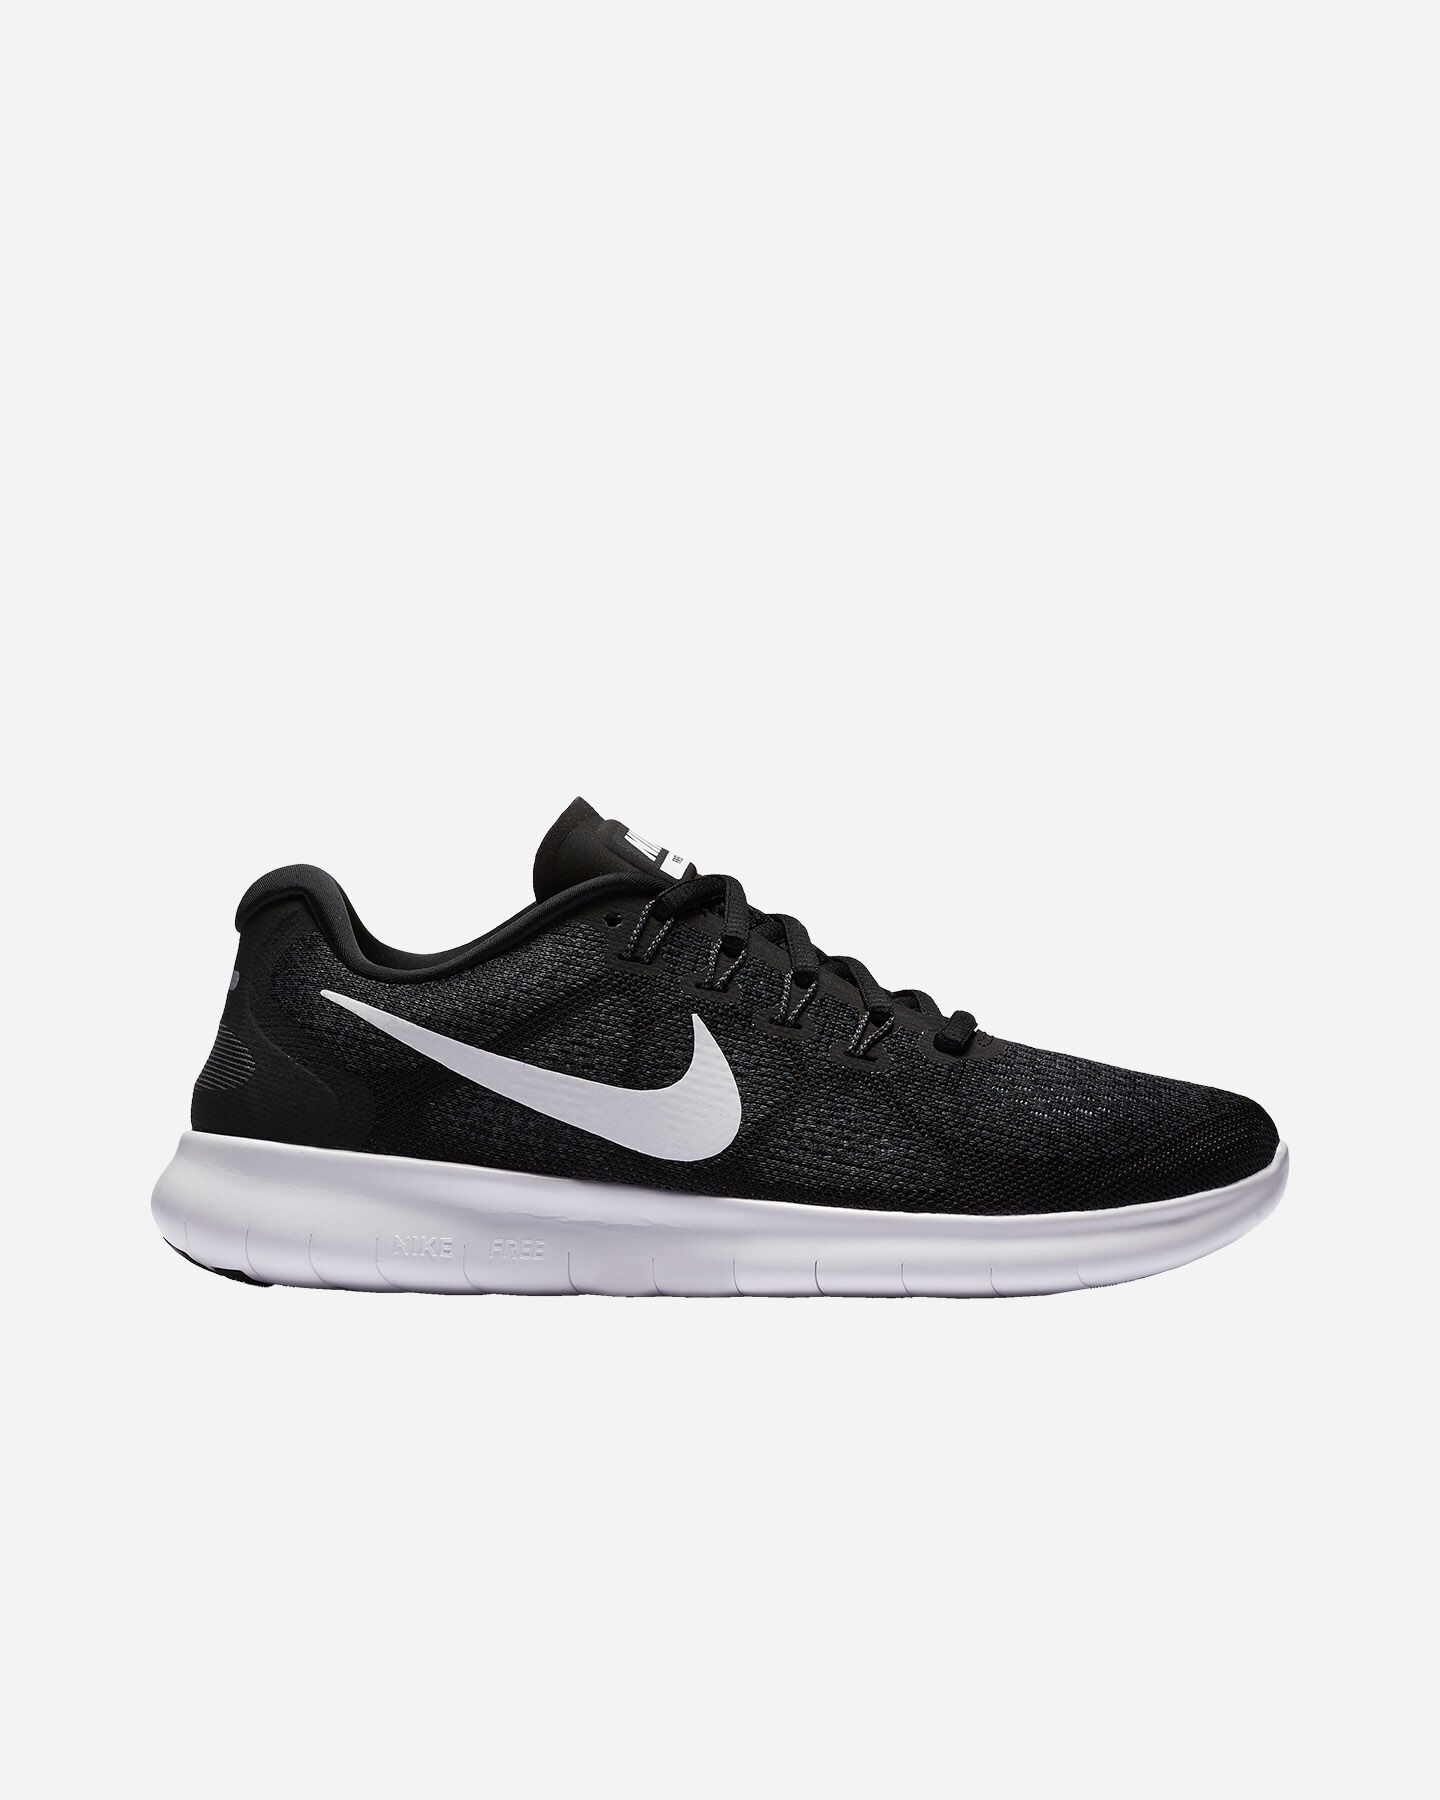 NIKE Free RN Uomo Scarpe Sneaker Scarpe da ginnastica Fitness Scarpe Cachi 43 44